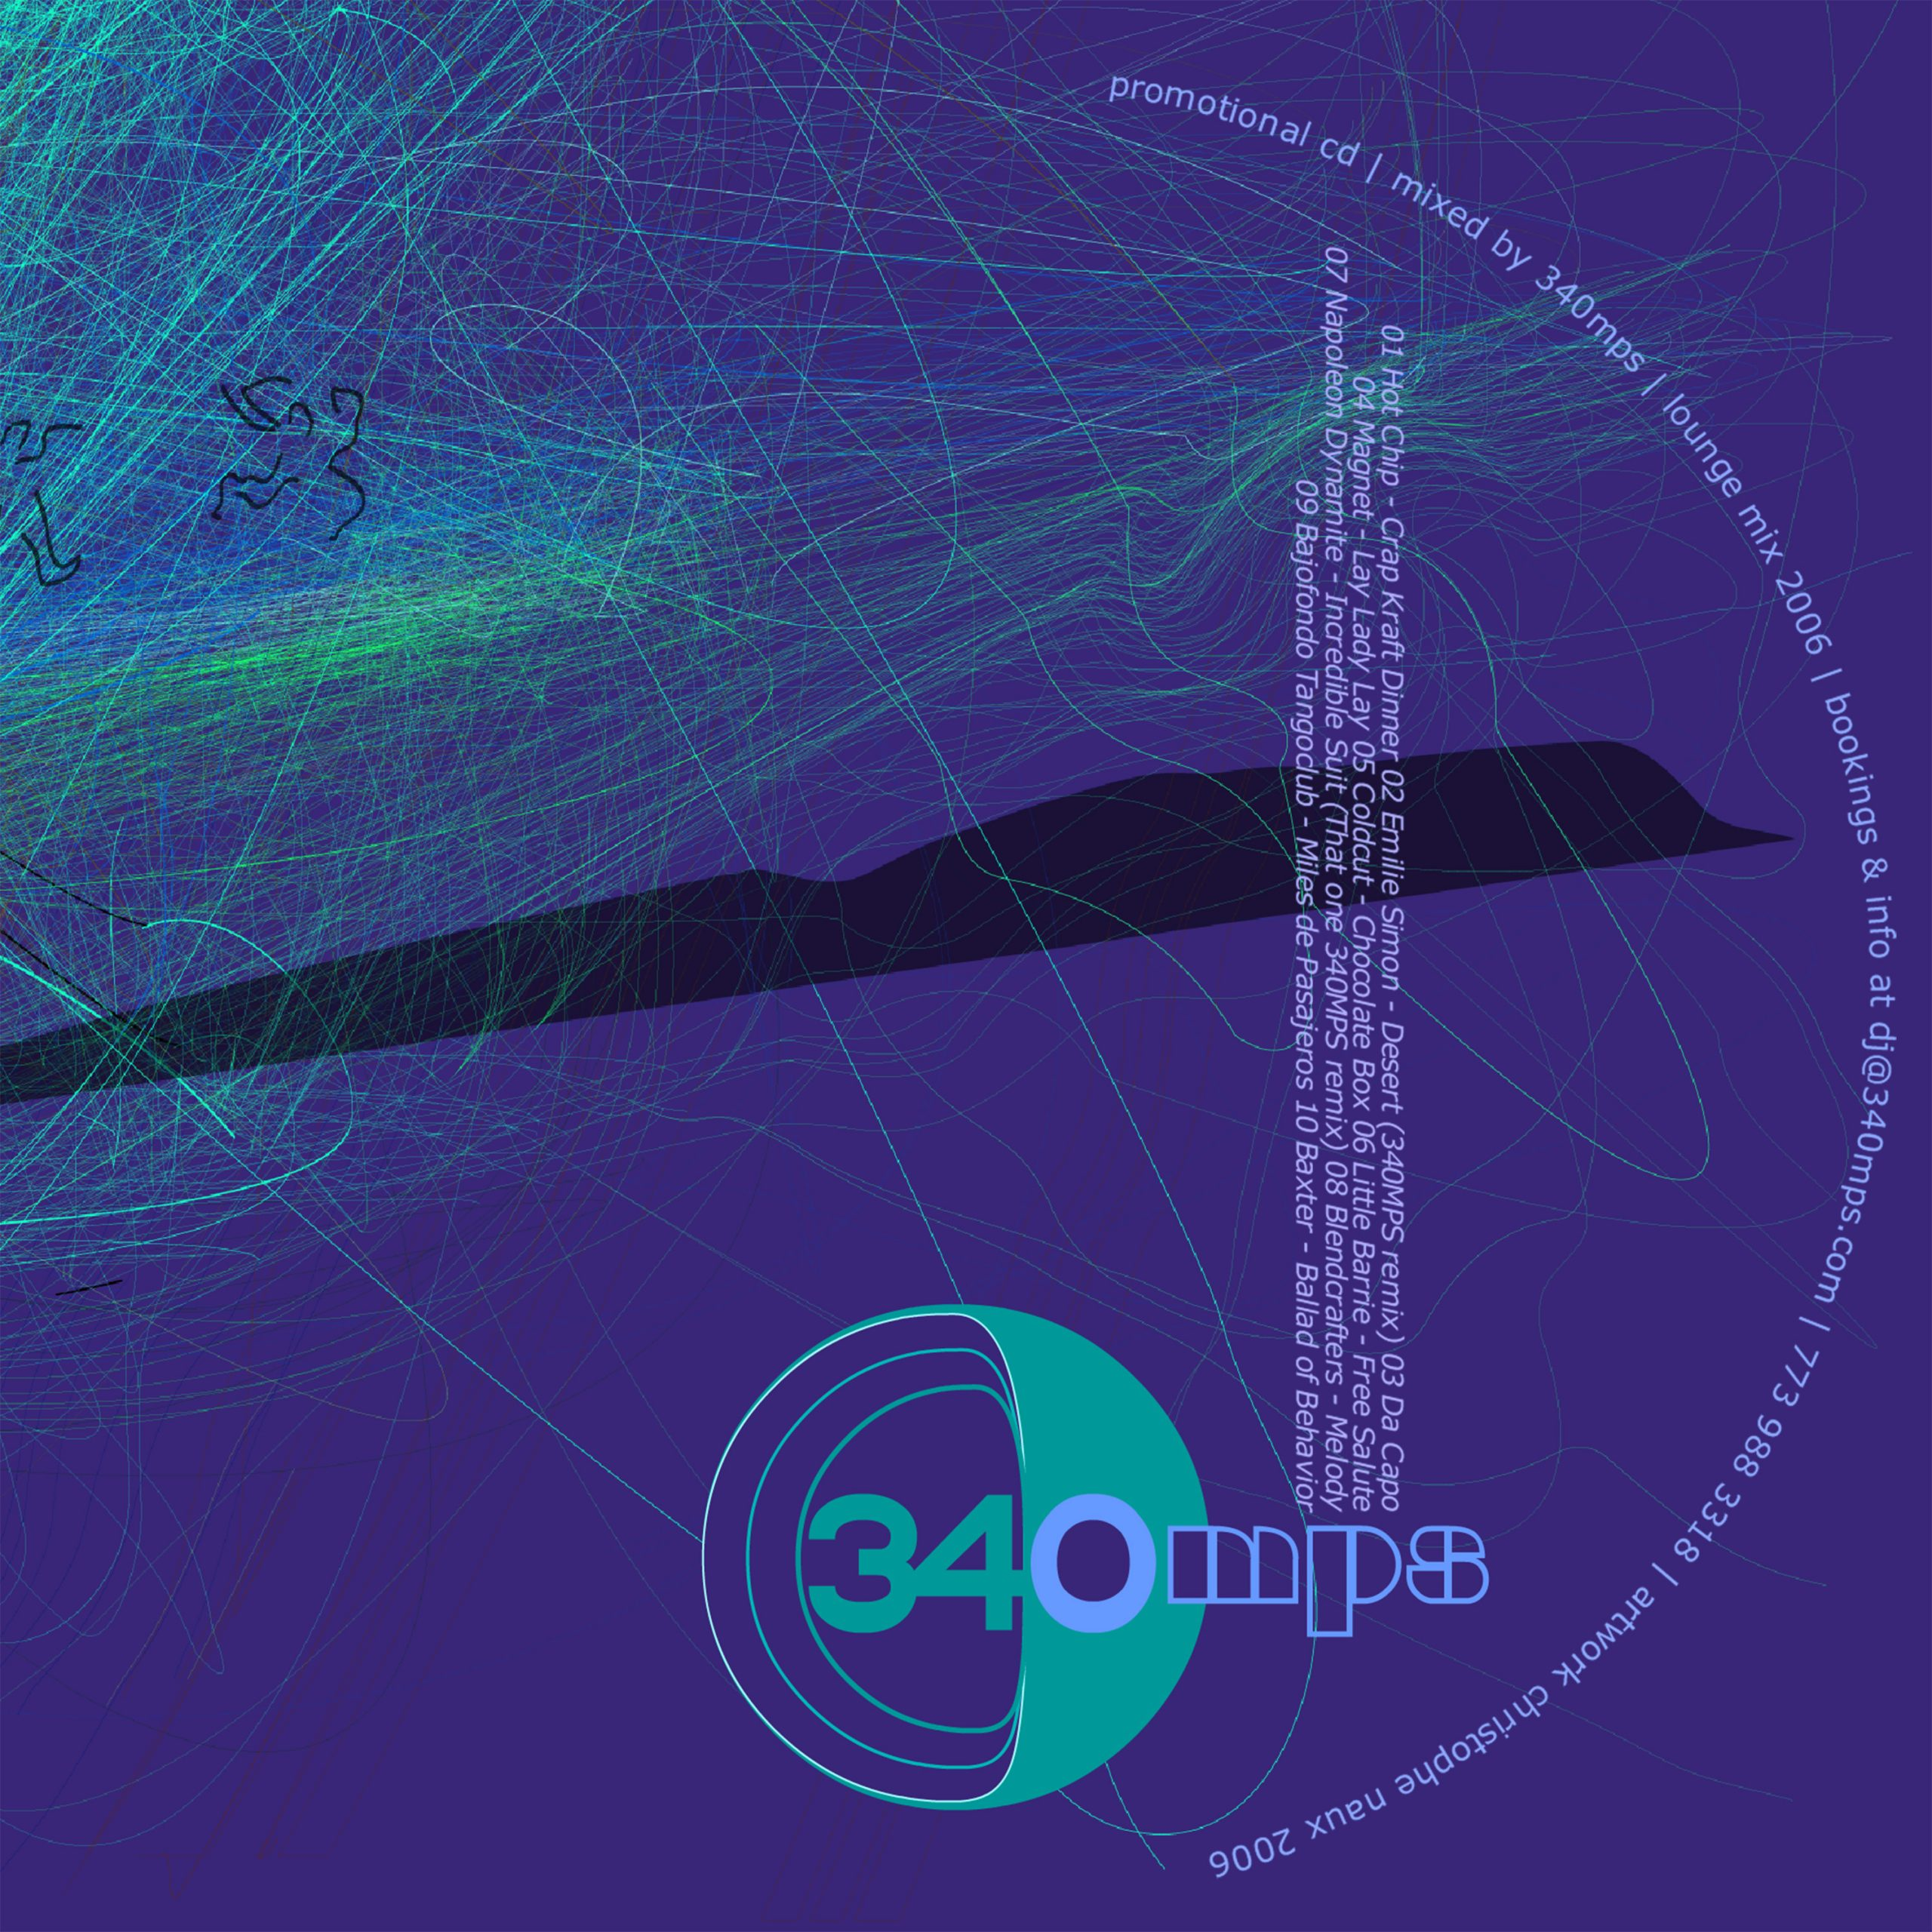 Ultra_violet - cover